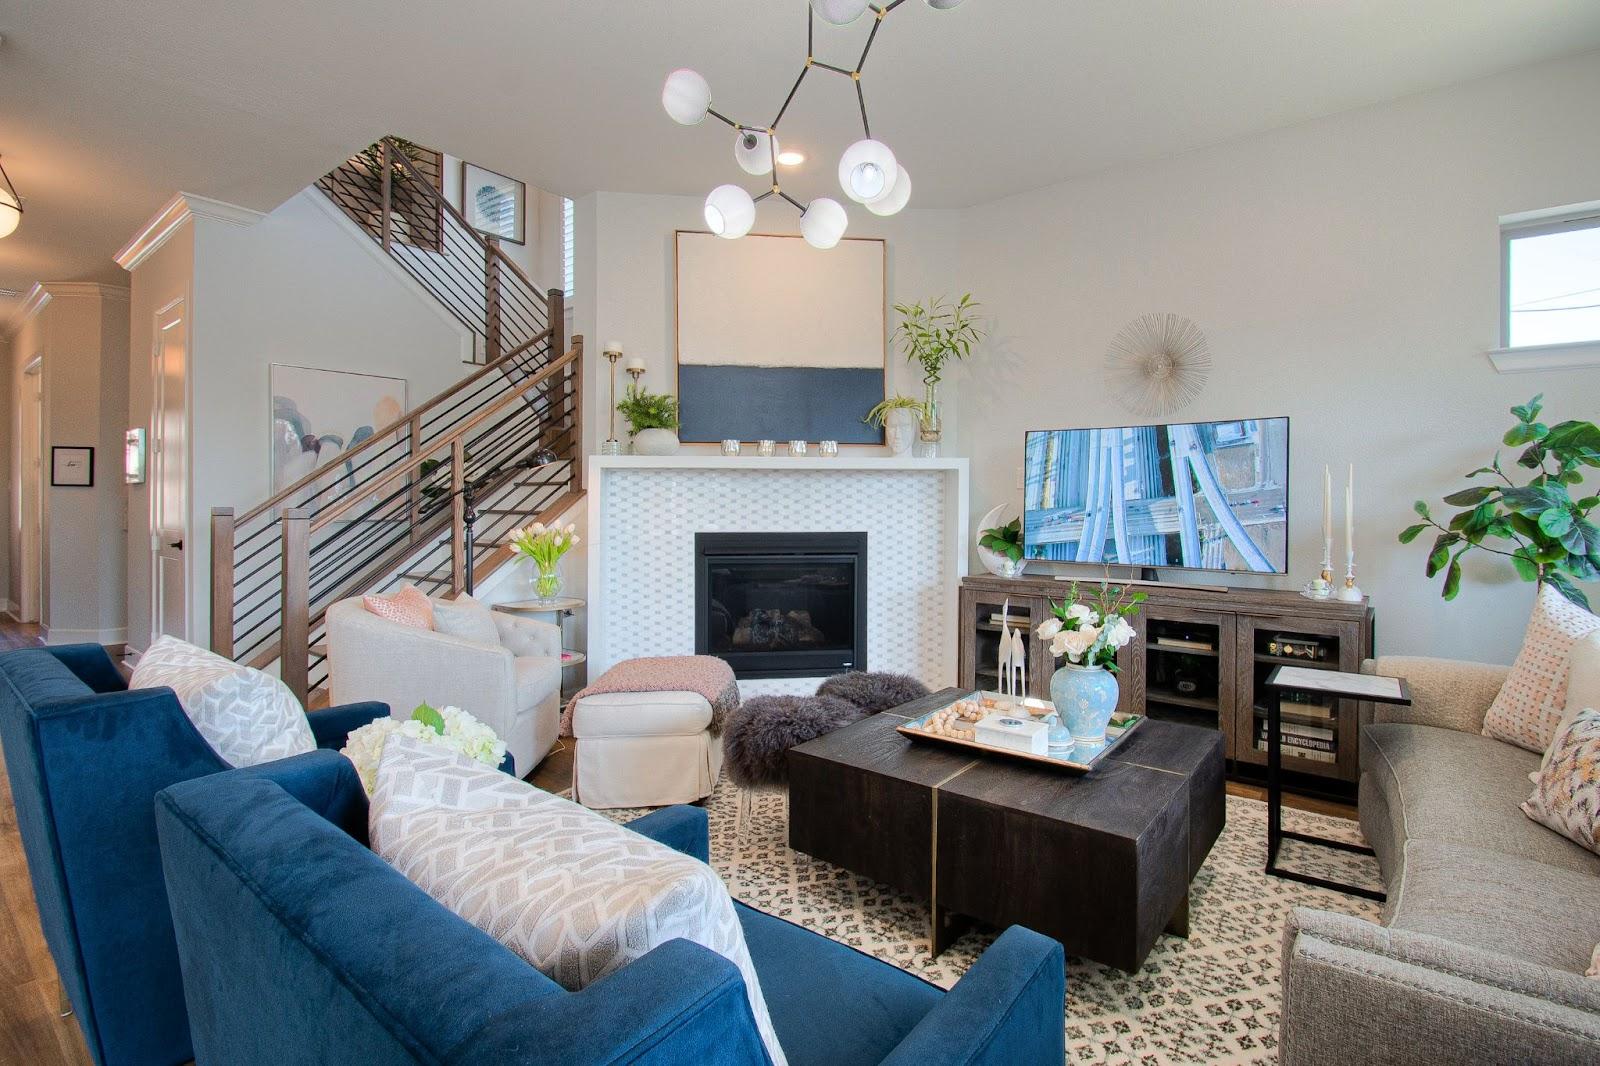 builder-grade home after custom interior design new fireplace surround tasteful timeless